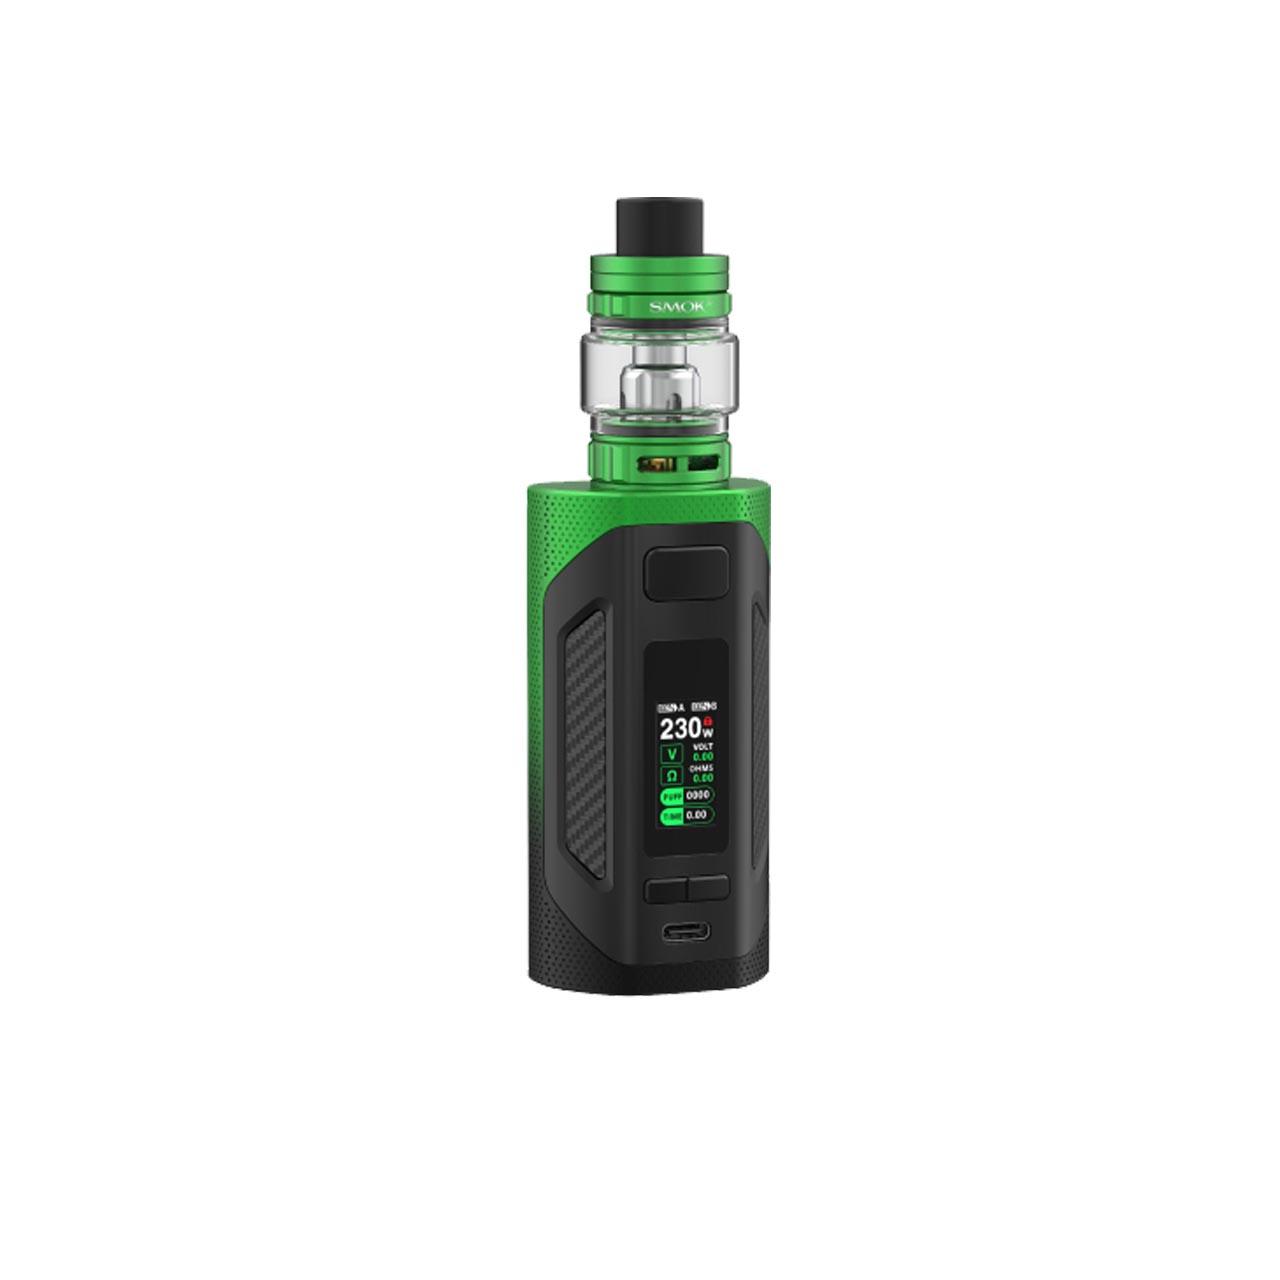 SMOK RIGEL Kit Green